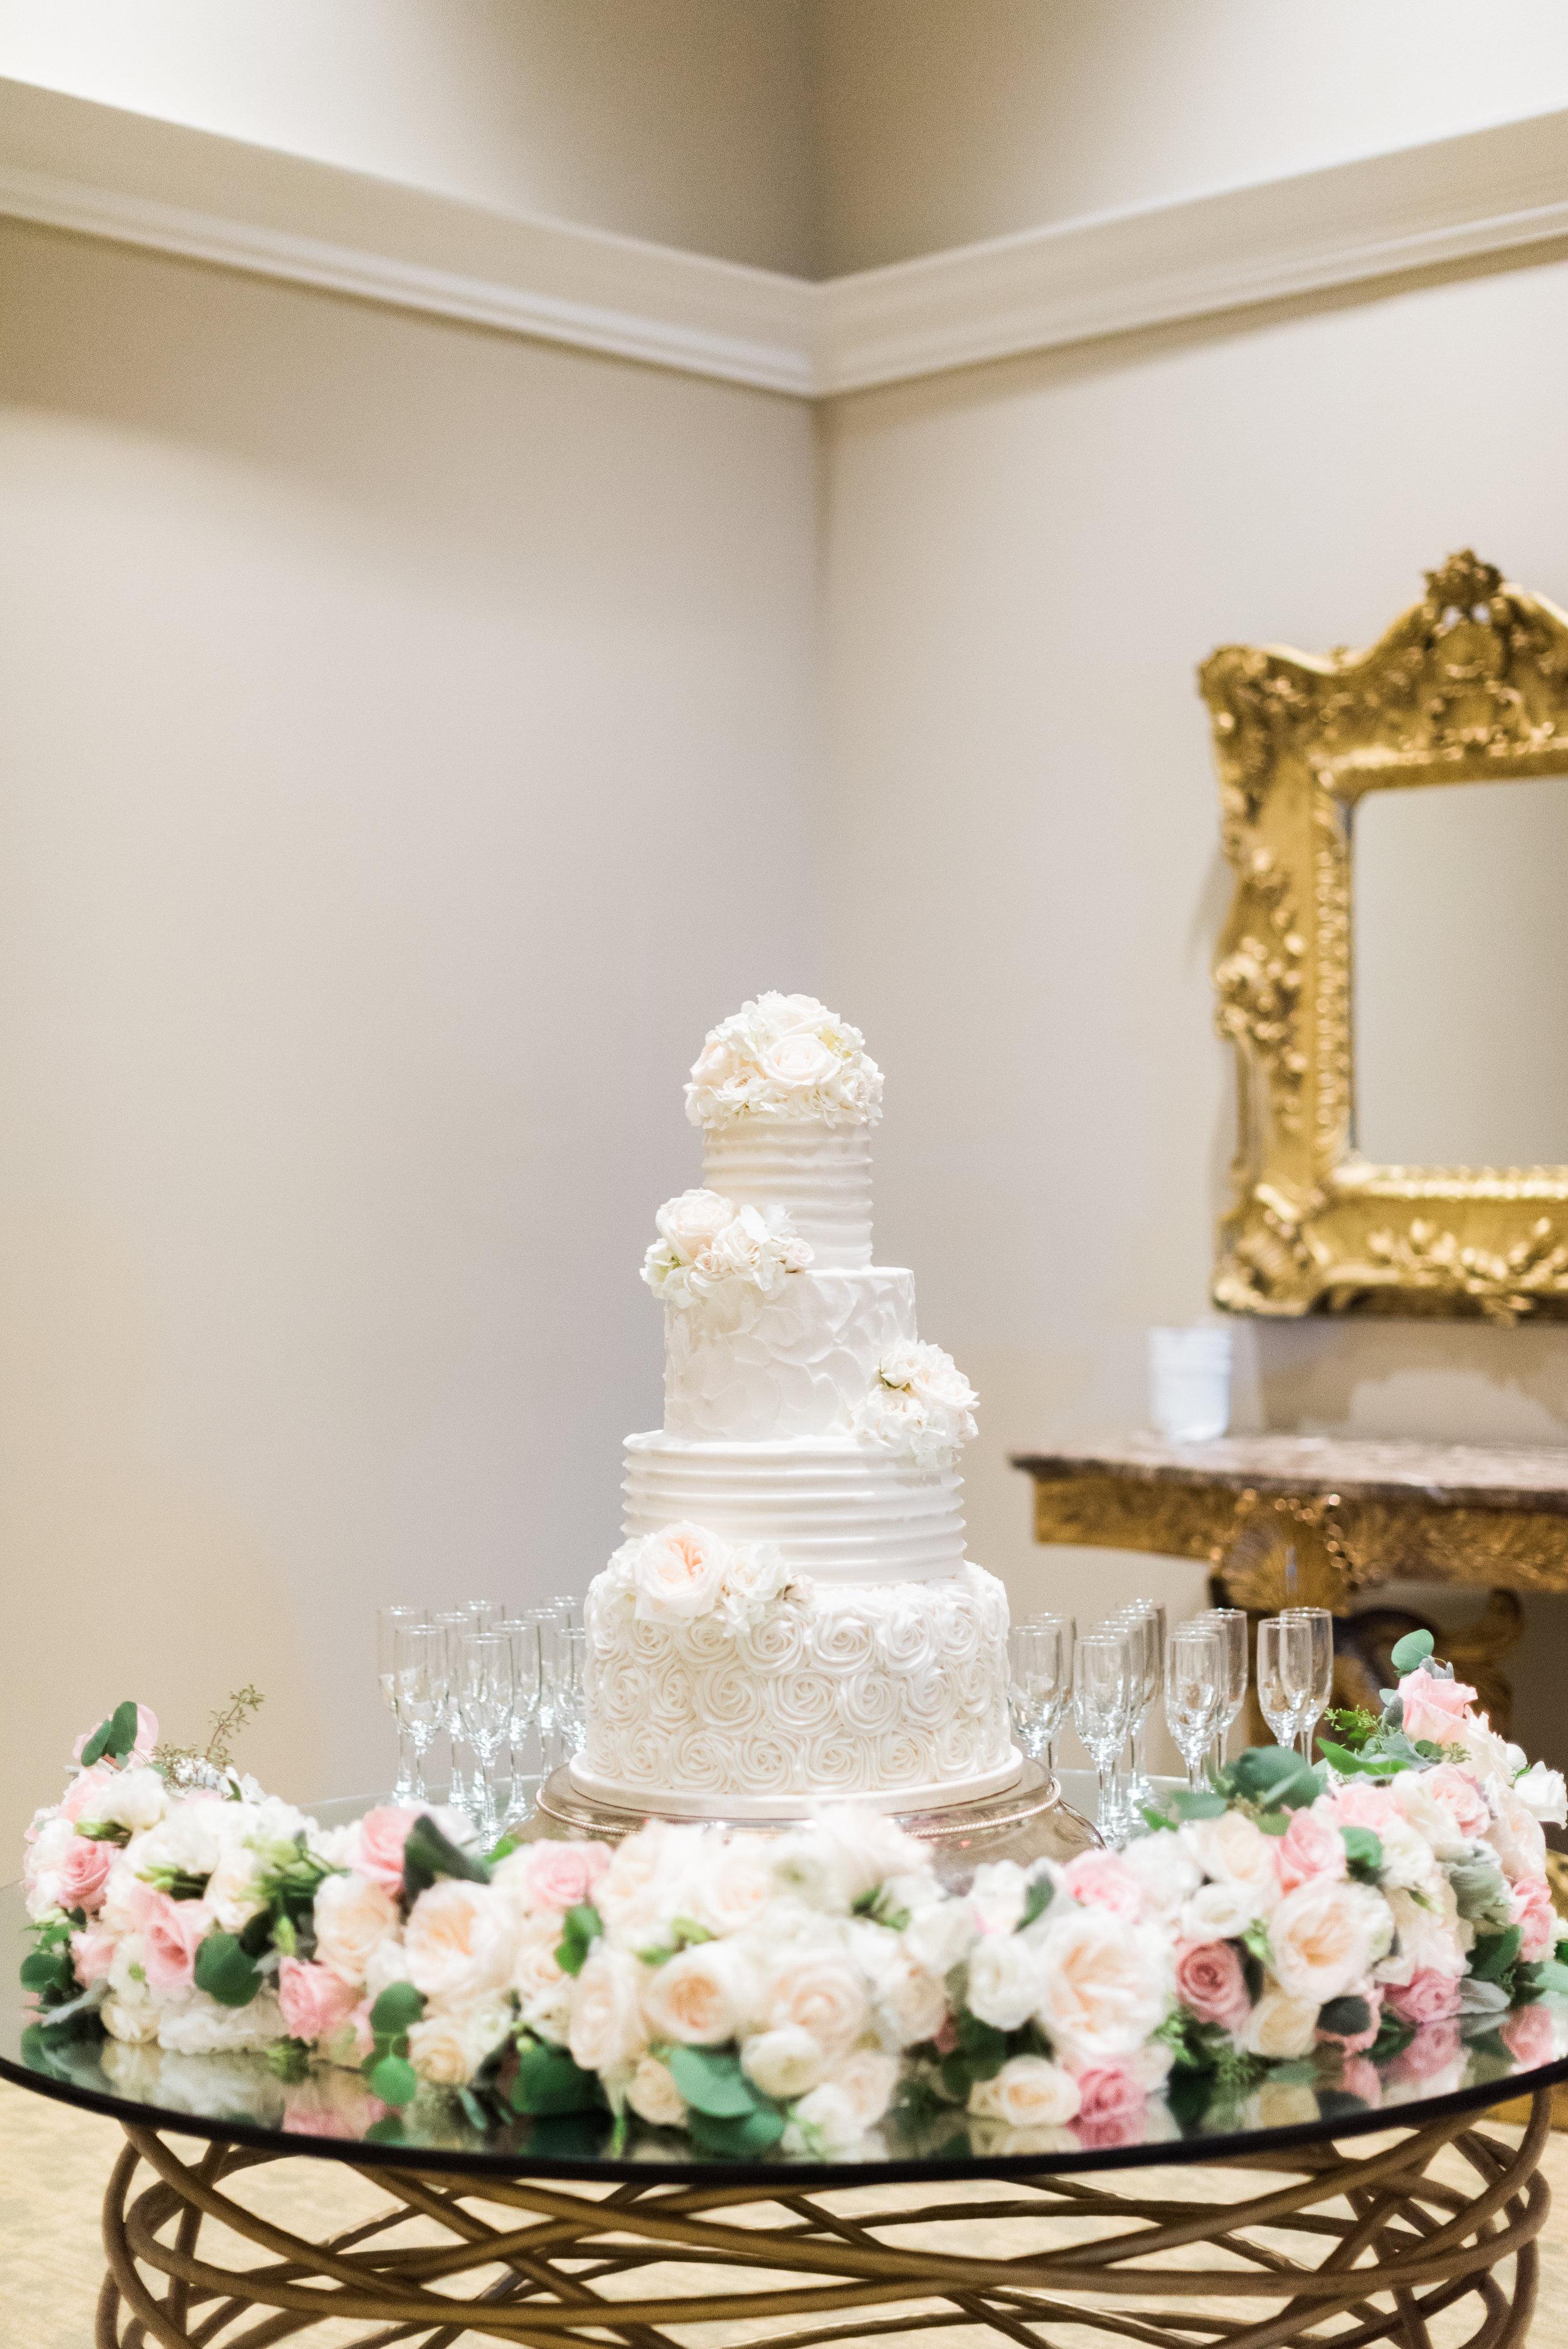 Southern Fete, Southern Wedding, Wedding Cake, Flowers by Rodney, Crystal Weddings, Le Pavillon